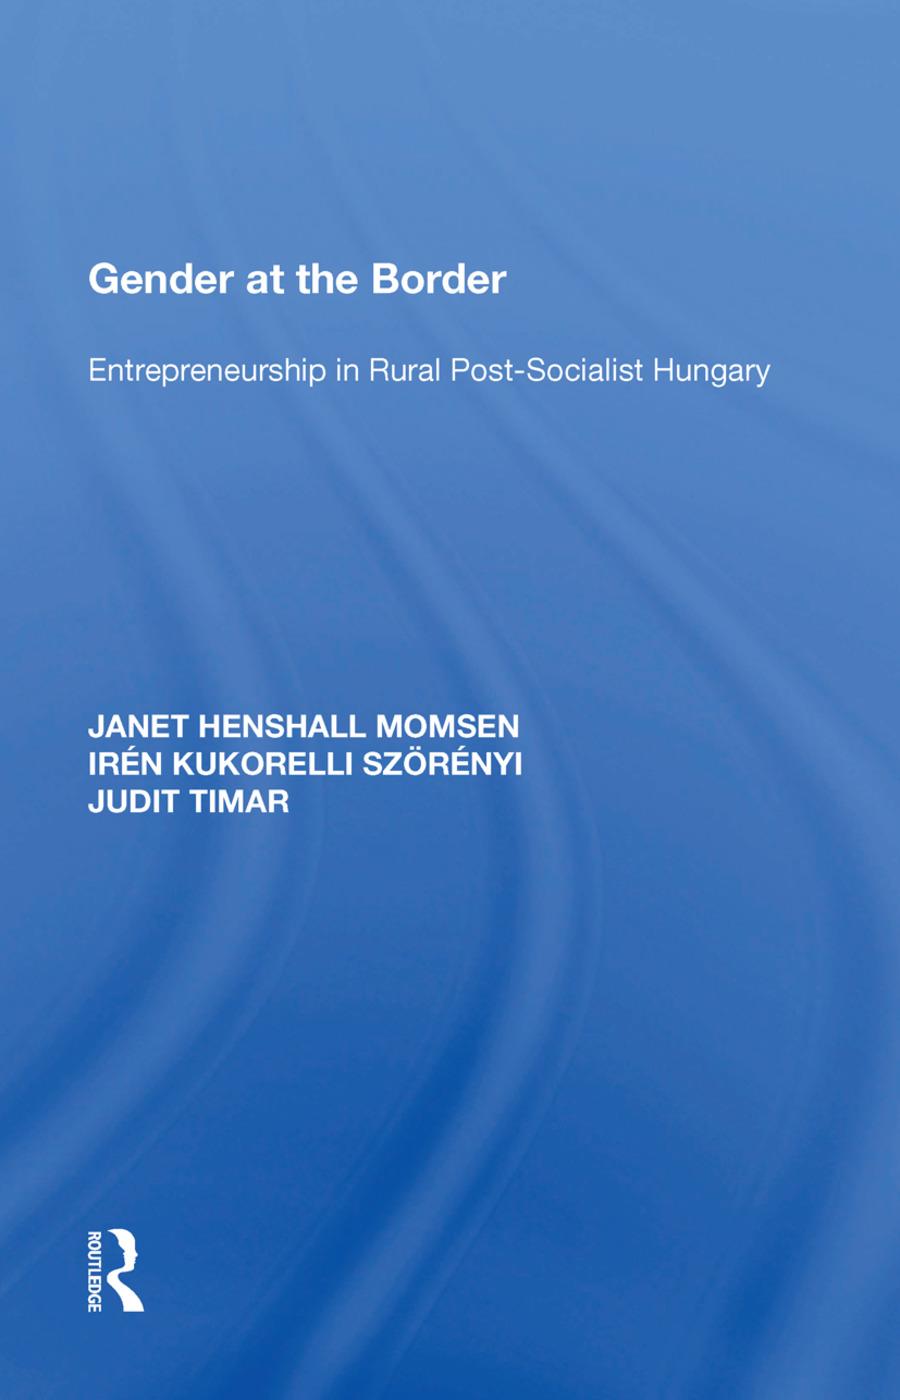 Gender at the Border